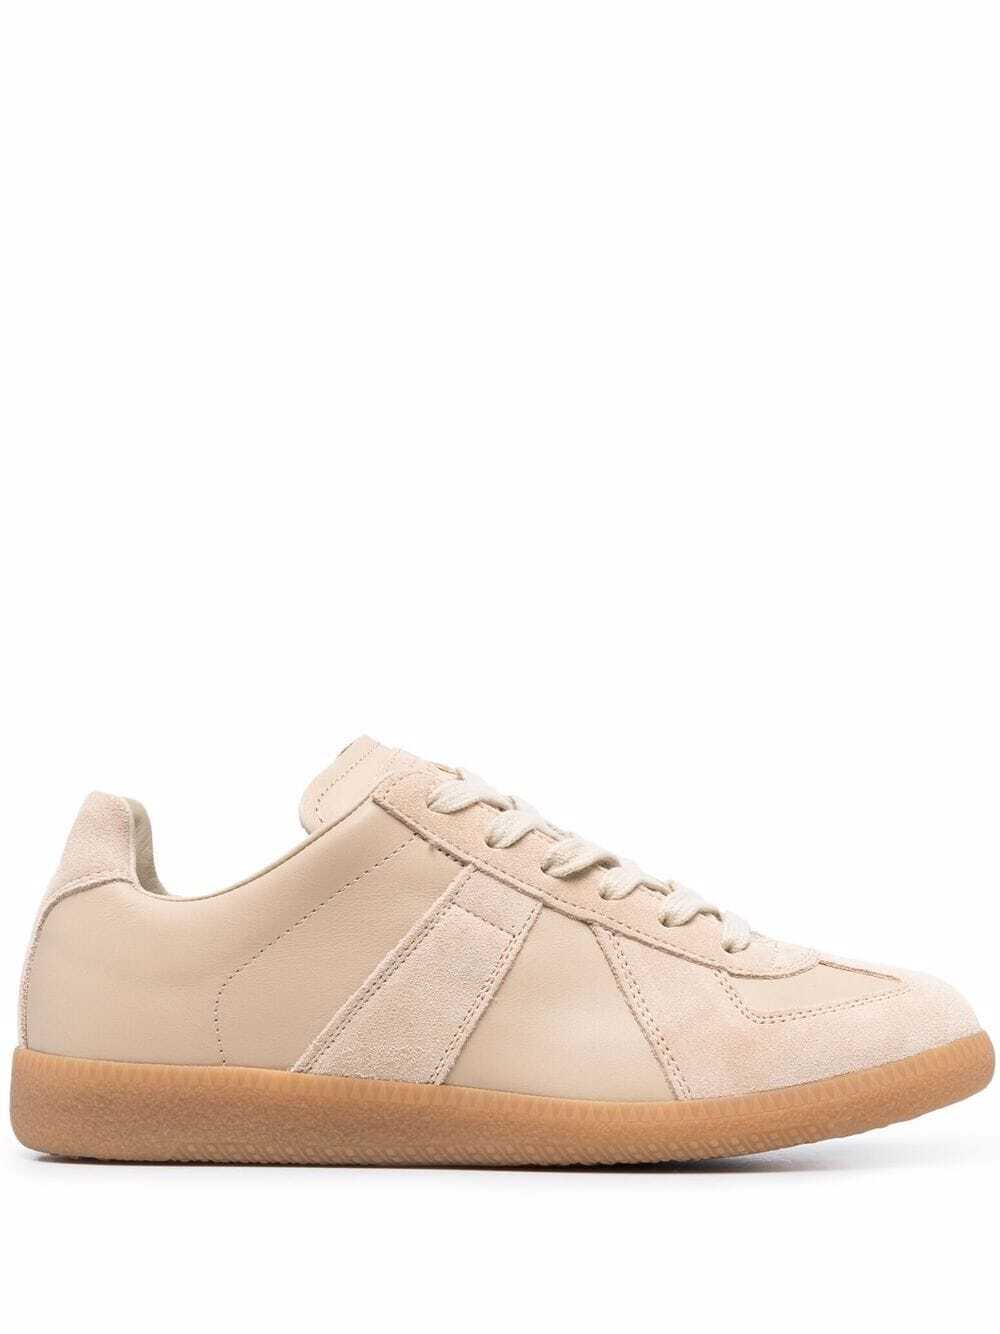 Replica-Sneaker aus Wildleder in Beige